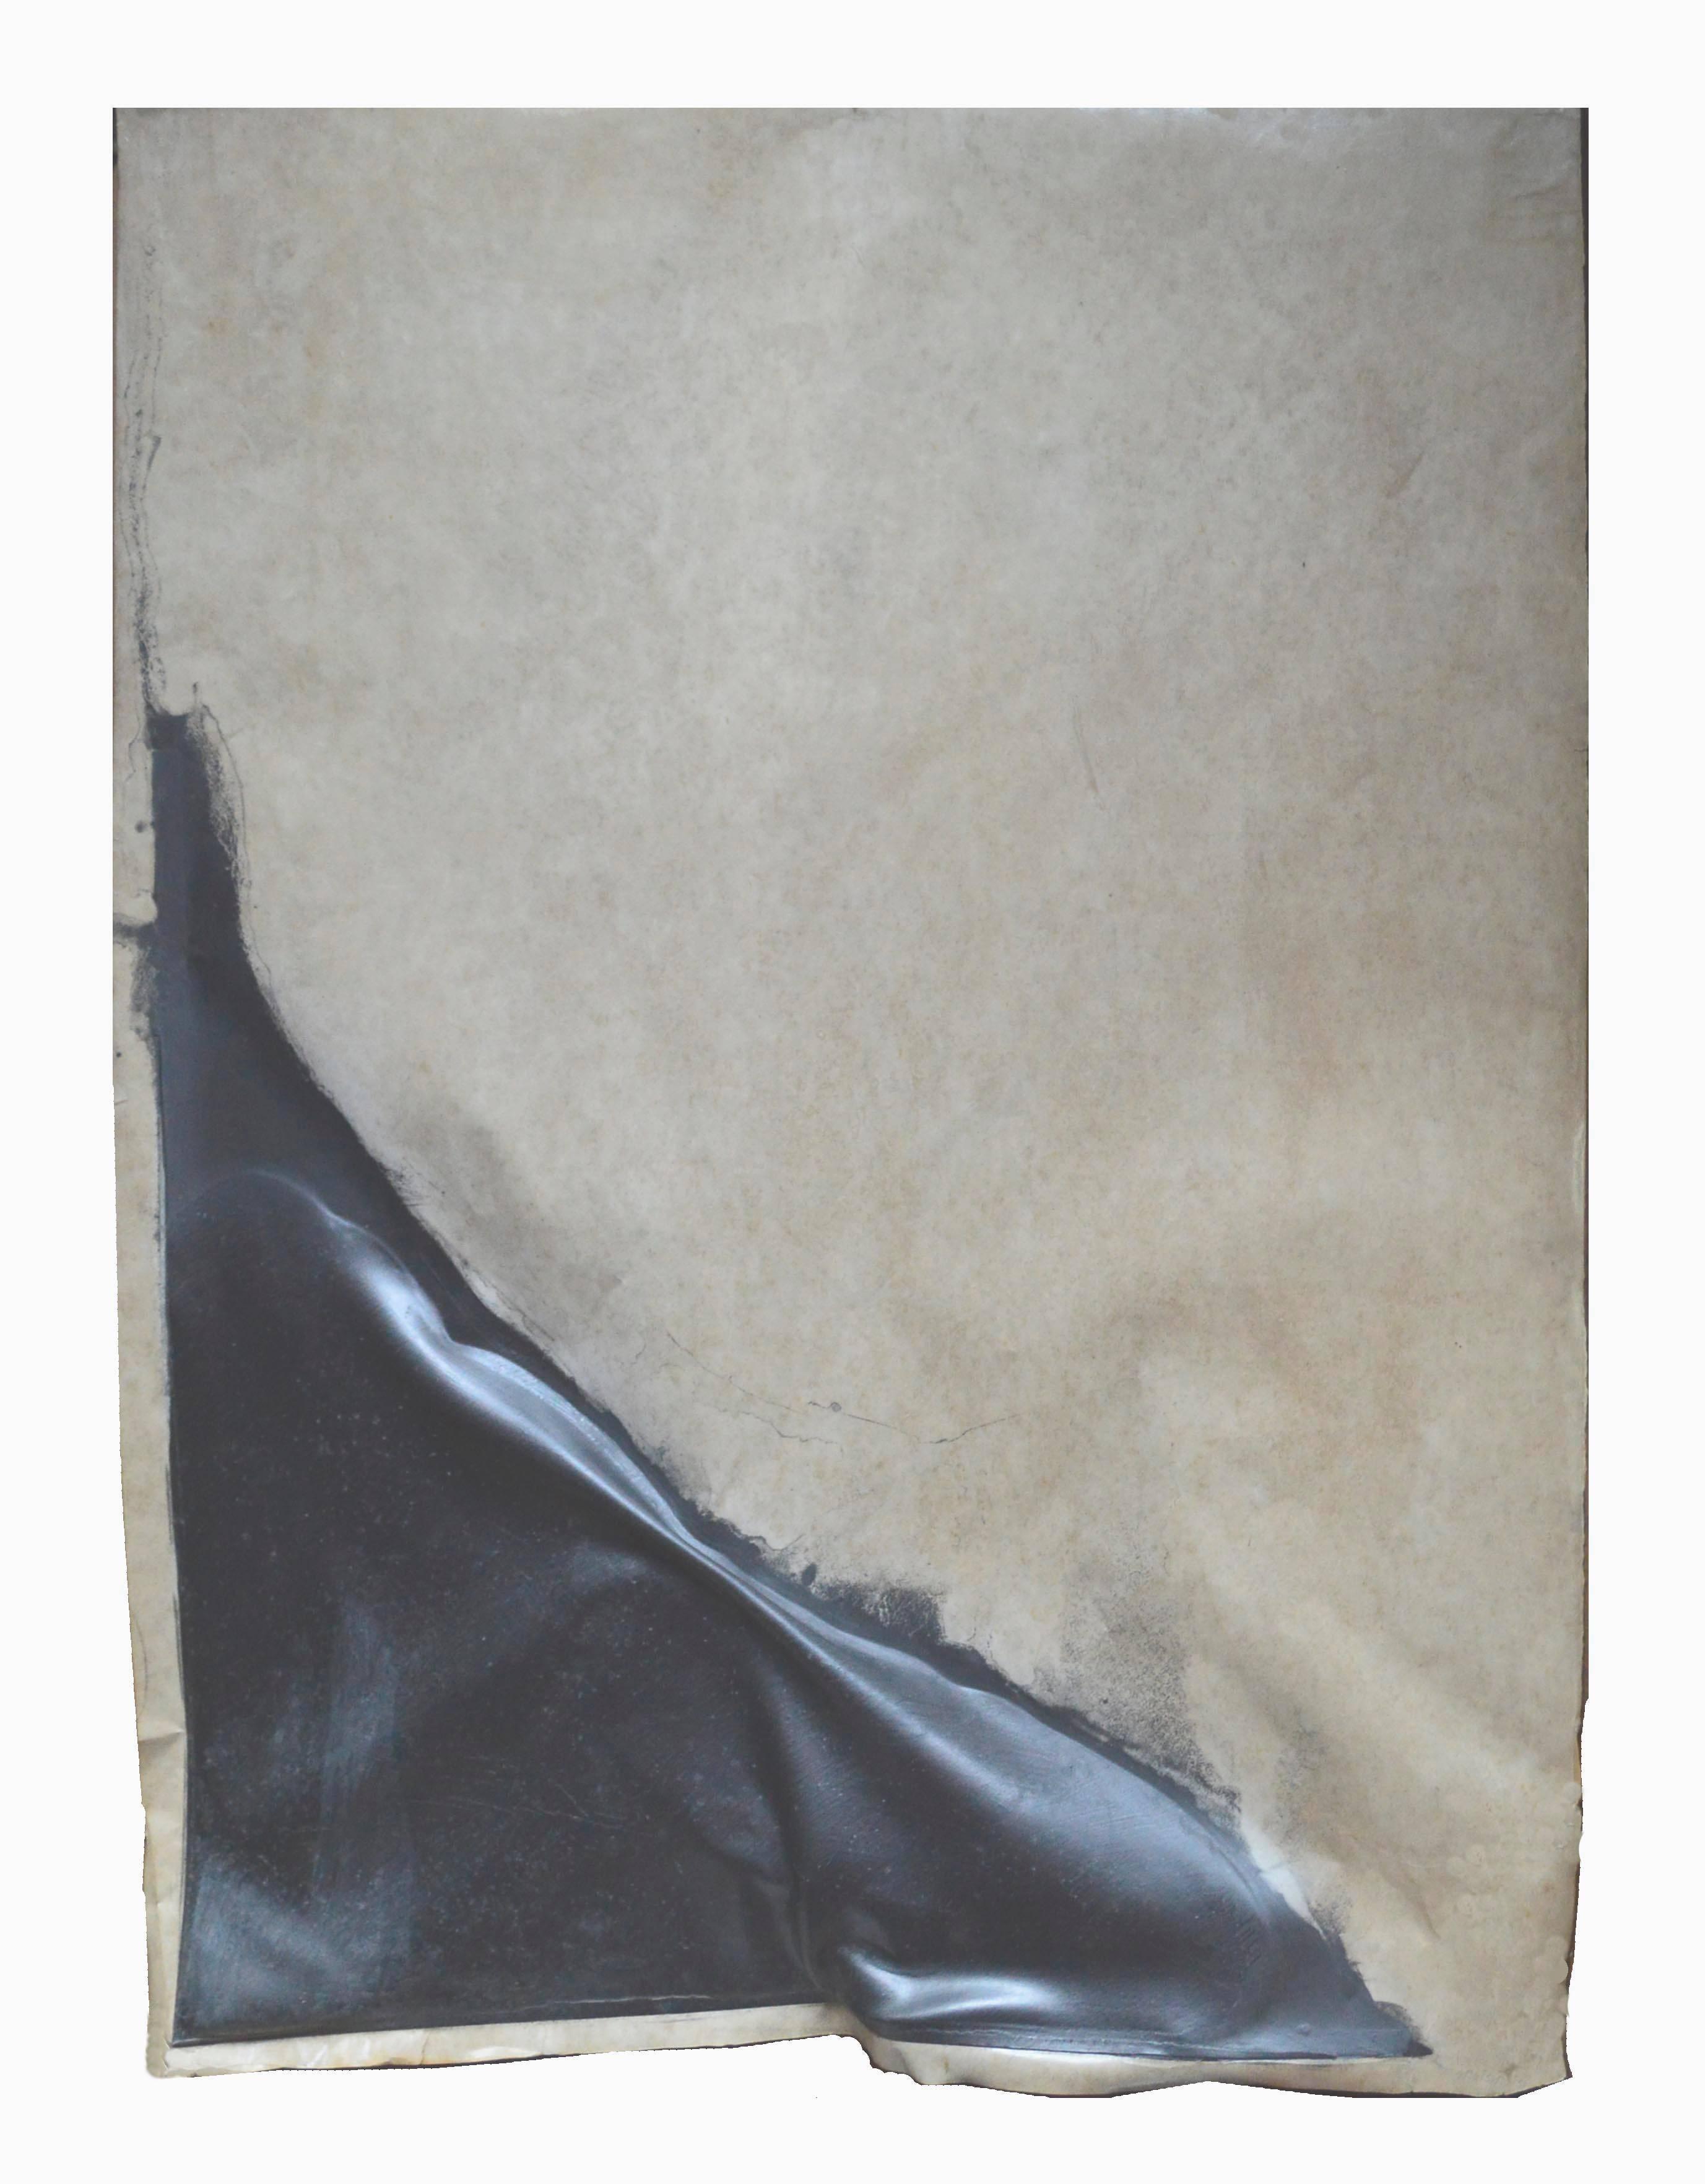 Gutai Object, Paris Period Takesada Matsutani